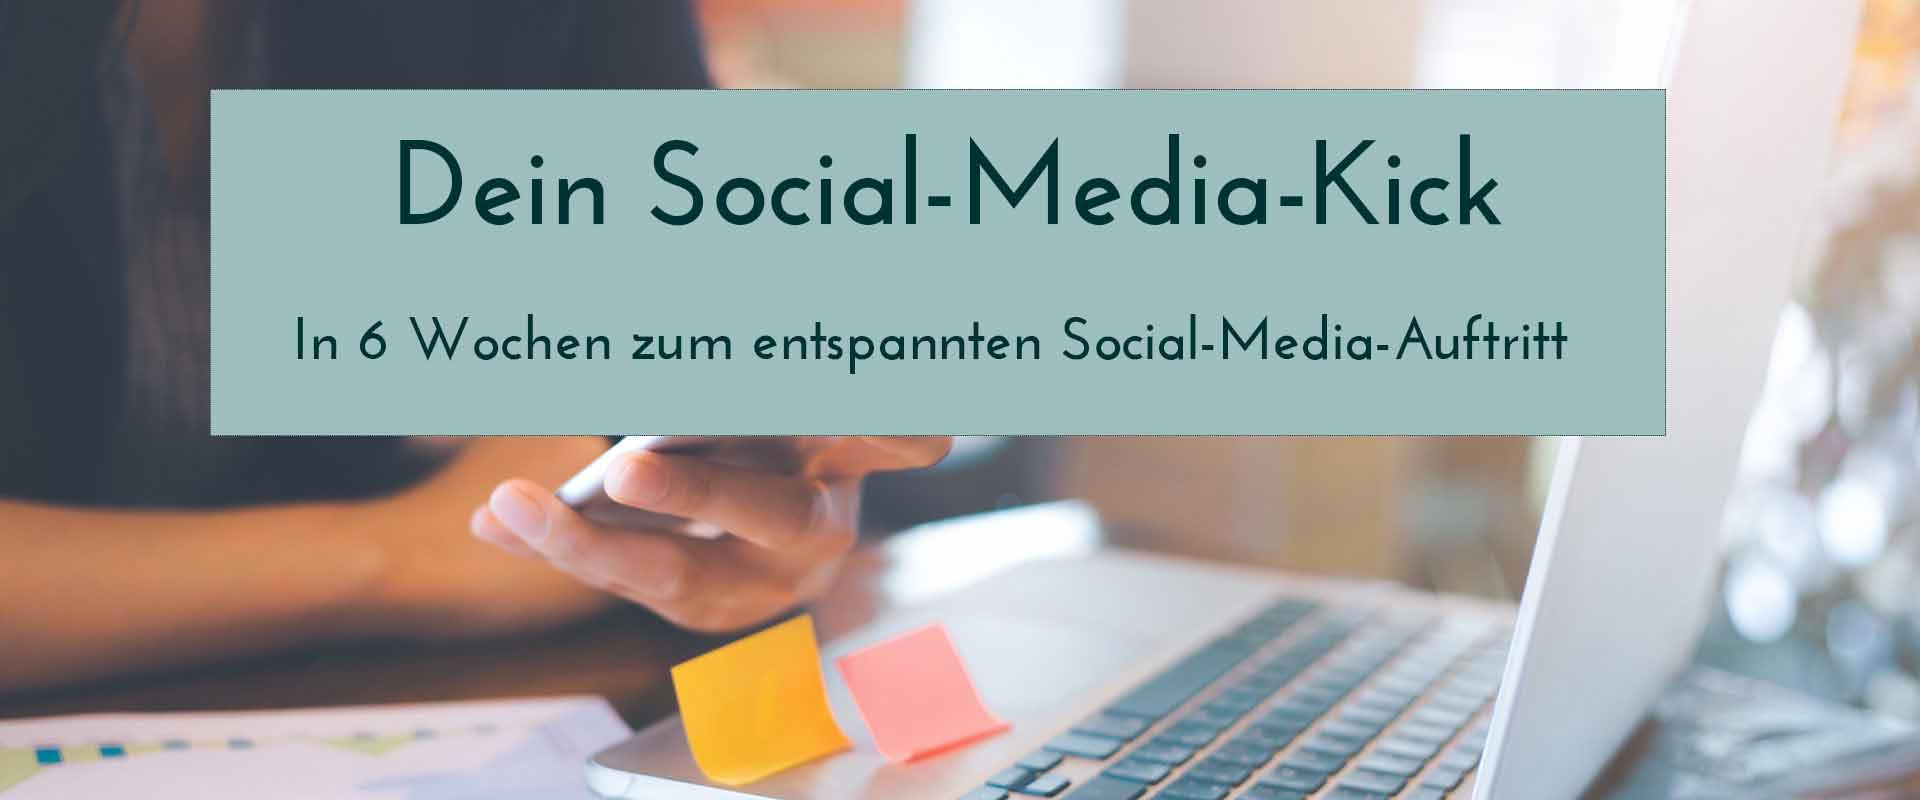 Dein Social Media Kick online Kurs